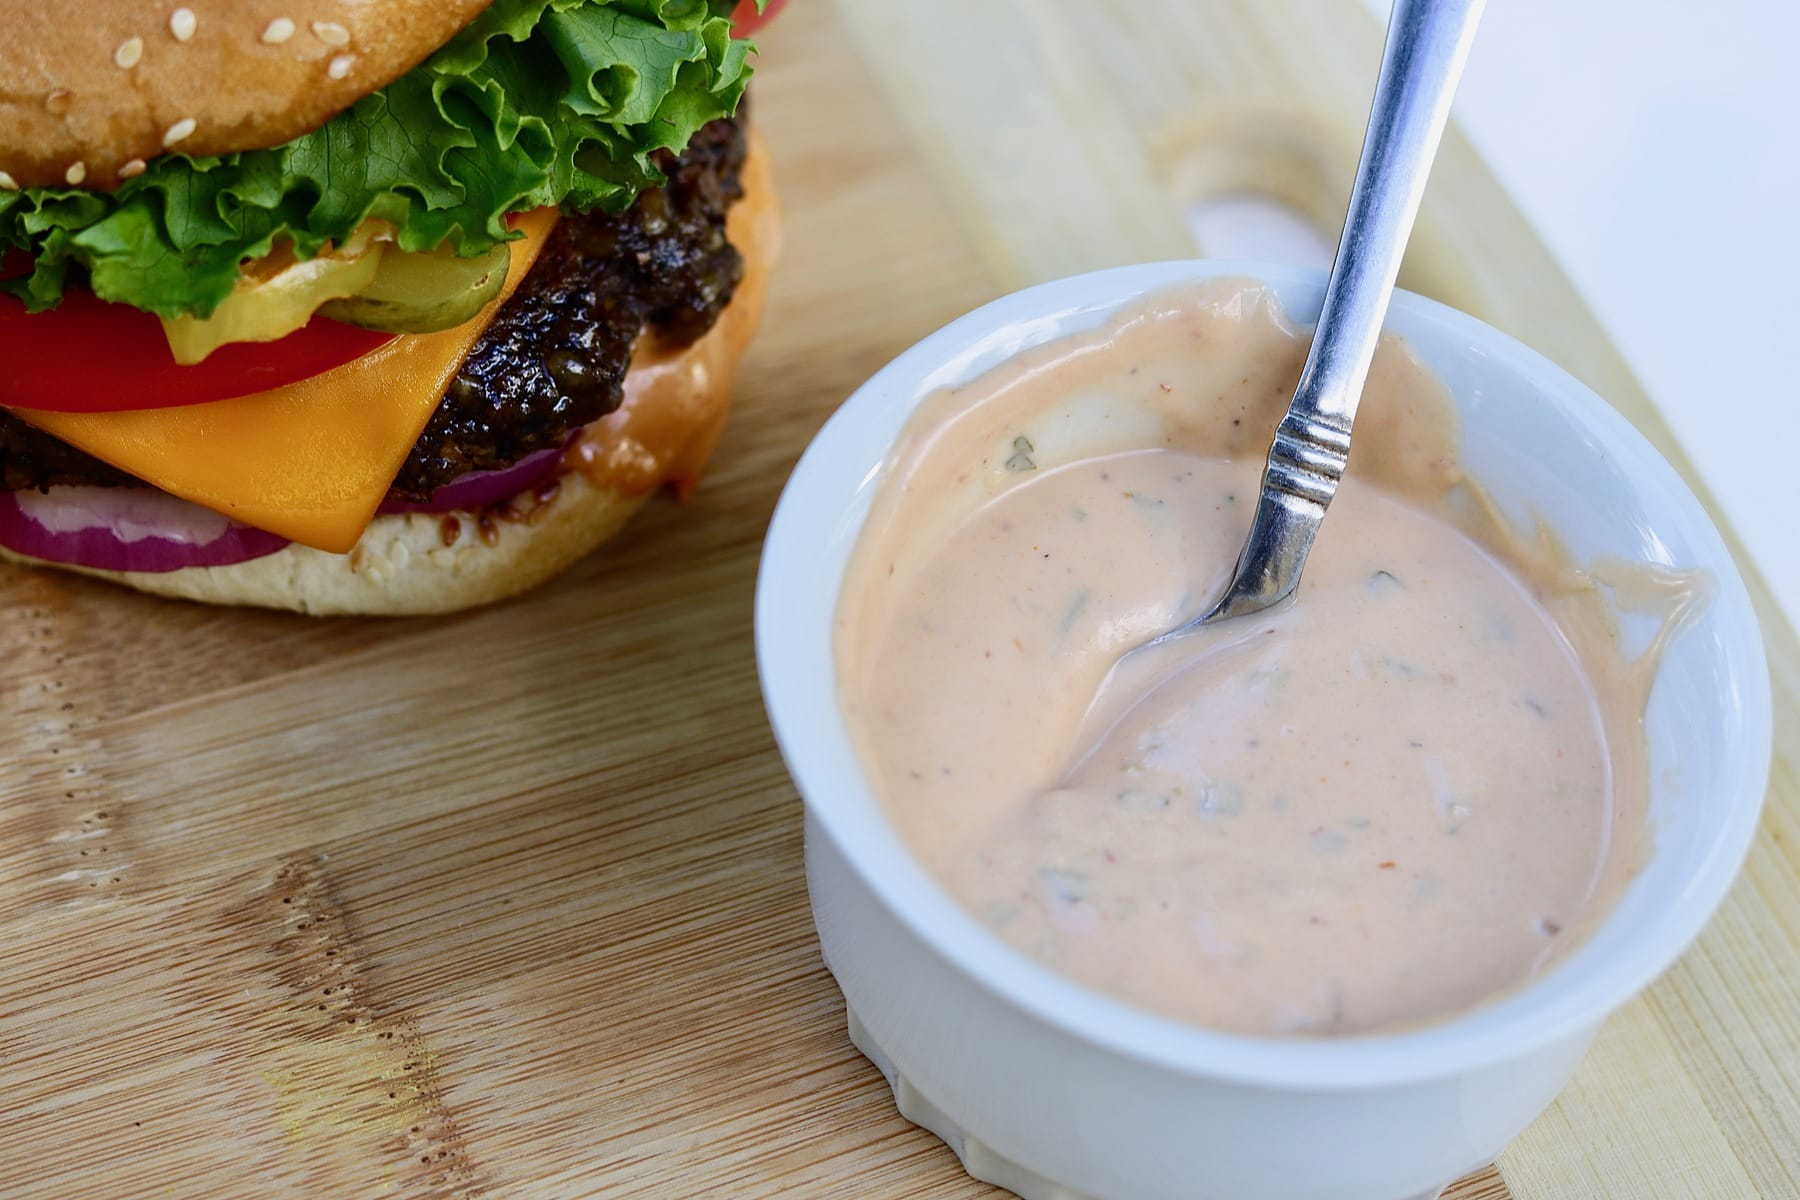 best vegan burger sauce recipe in white bowl on wooden cutting board